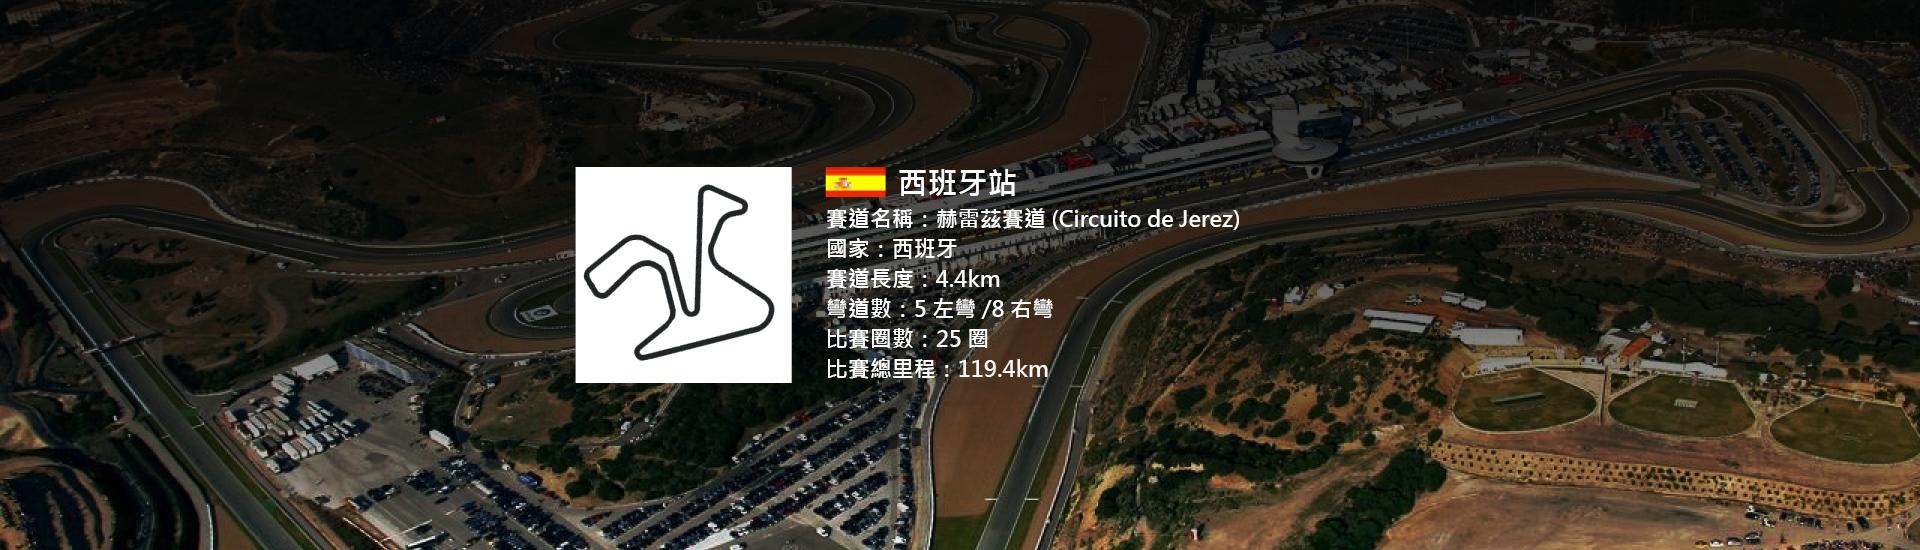 2018 MotoGP 西班牙站